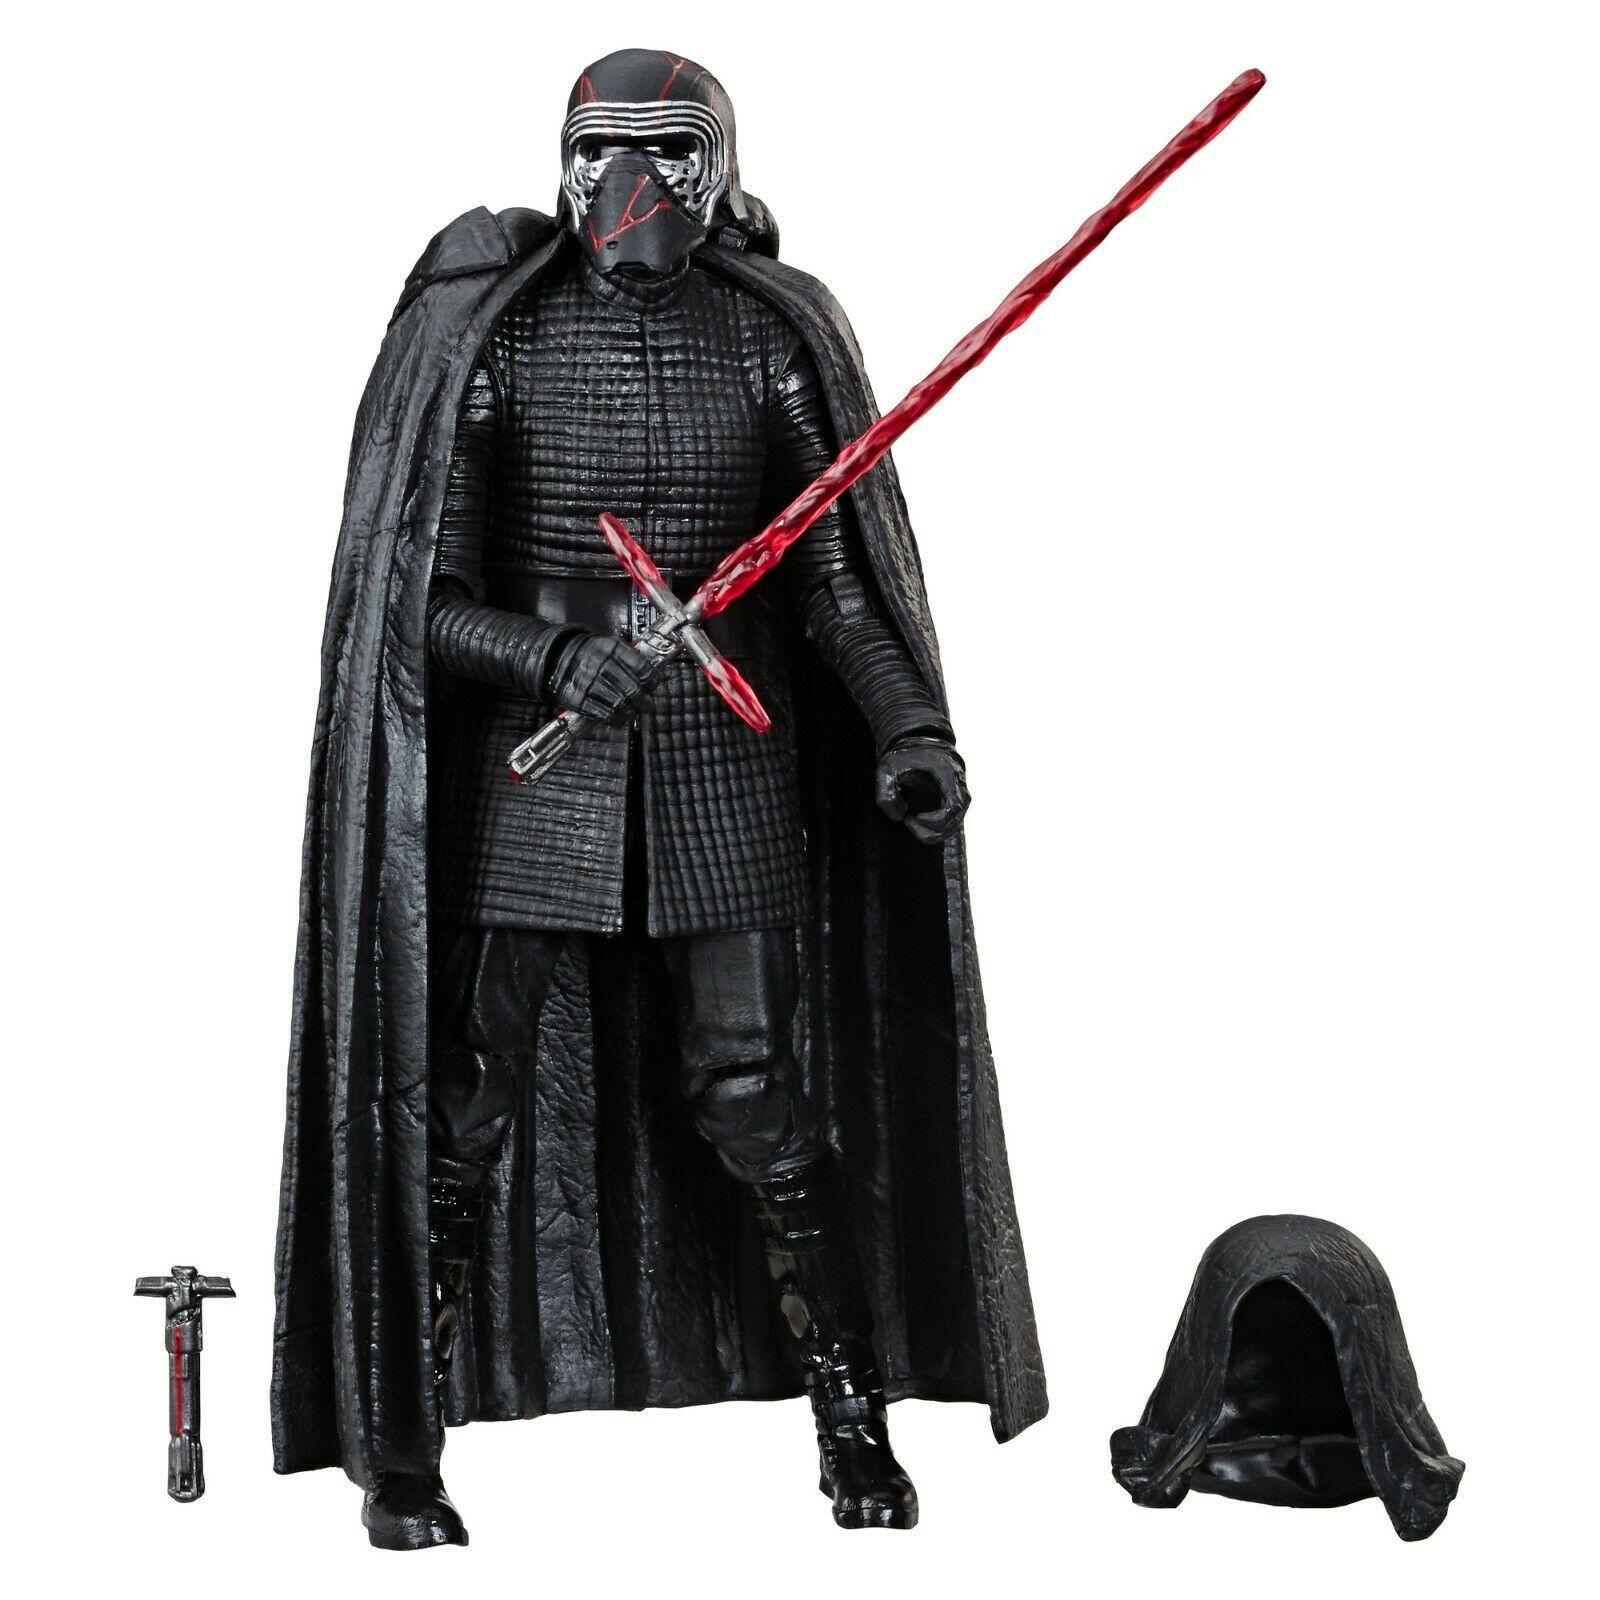 Star Wars Black Series Supreme Leader Kylo Ren 6 Inch Figure ROS #90 In Stock